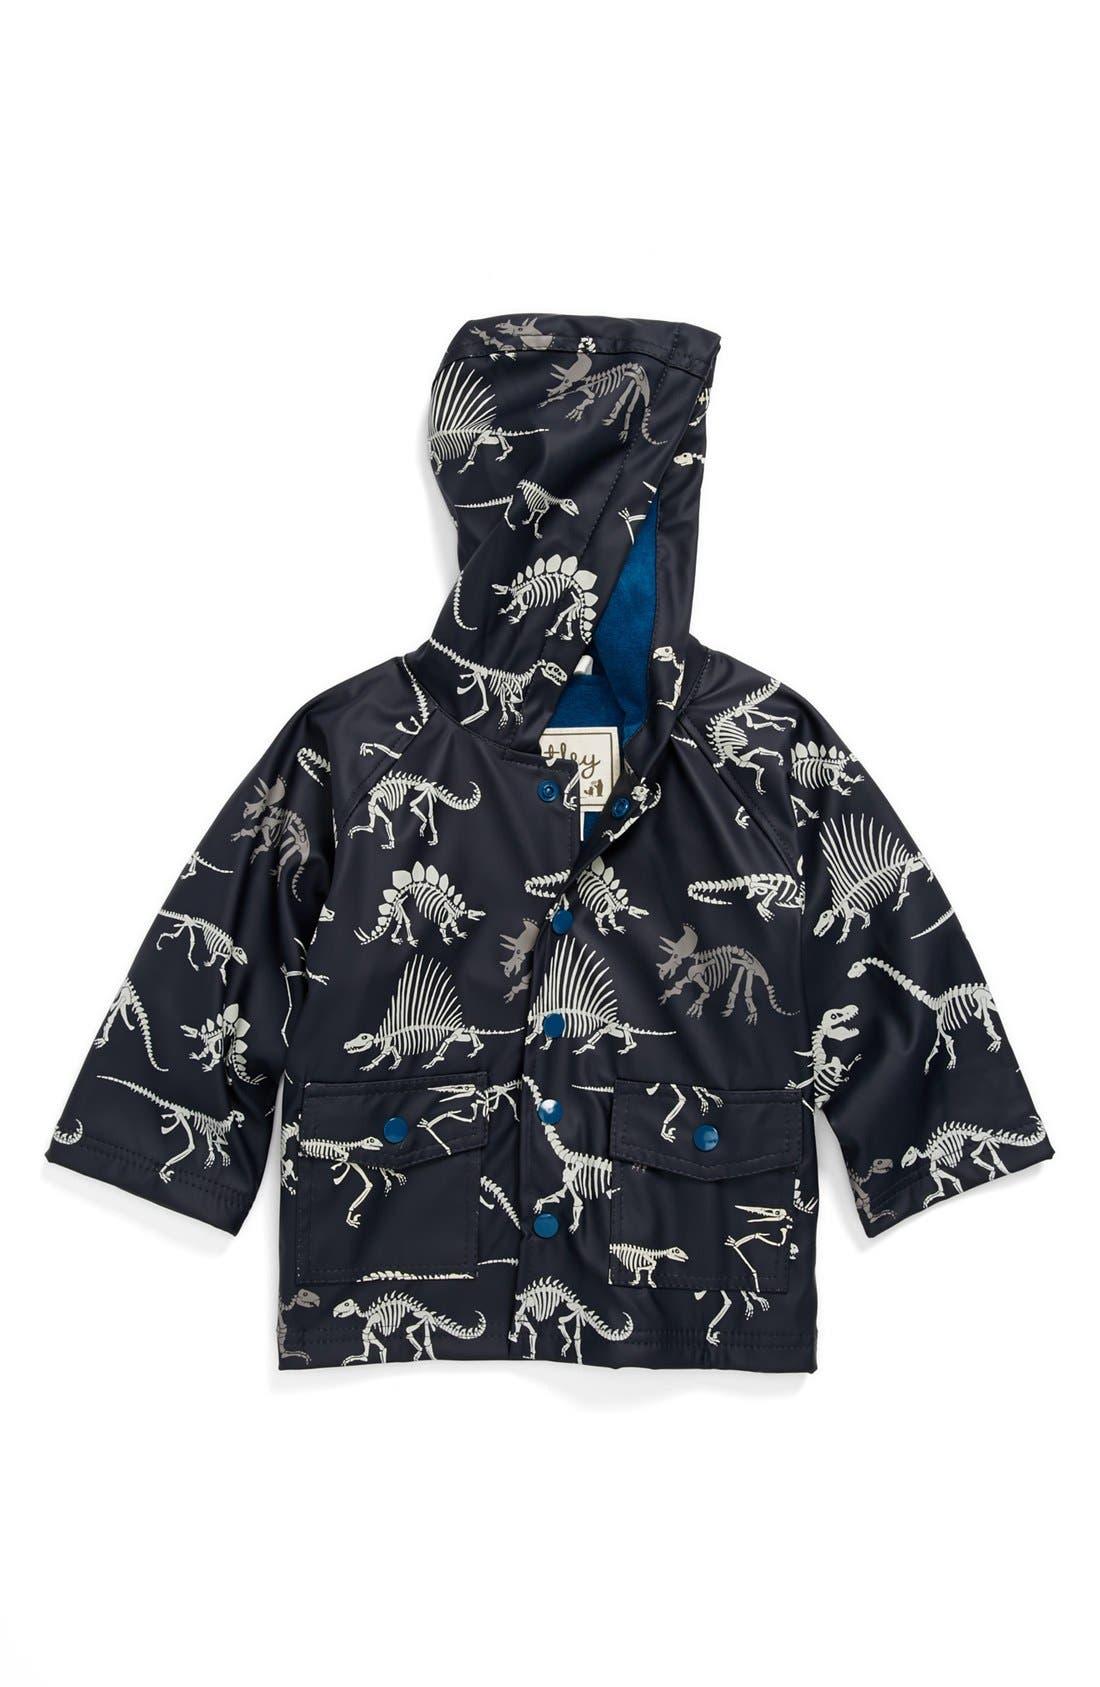 Alternate Image 1 Selected - Hatley 'Dino Bones' Rain Jacket (Baby Boys, Toddler Boys, Little Boys & Big Boys)